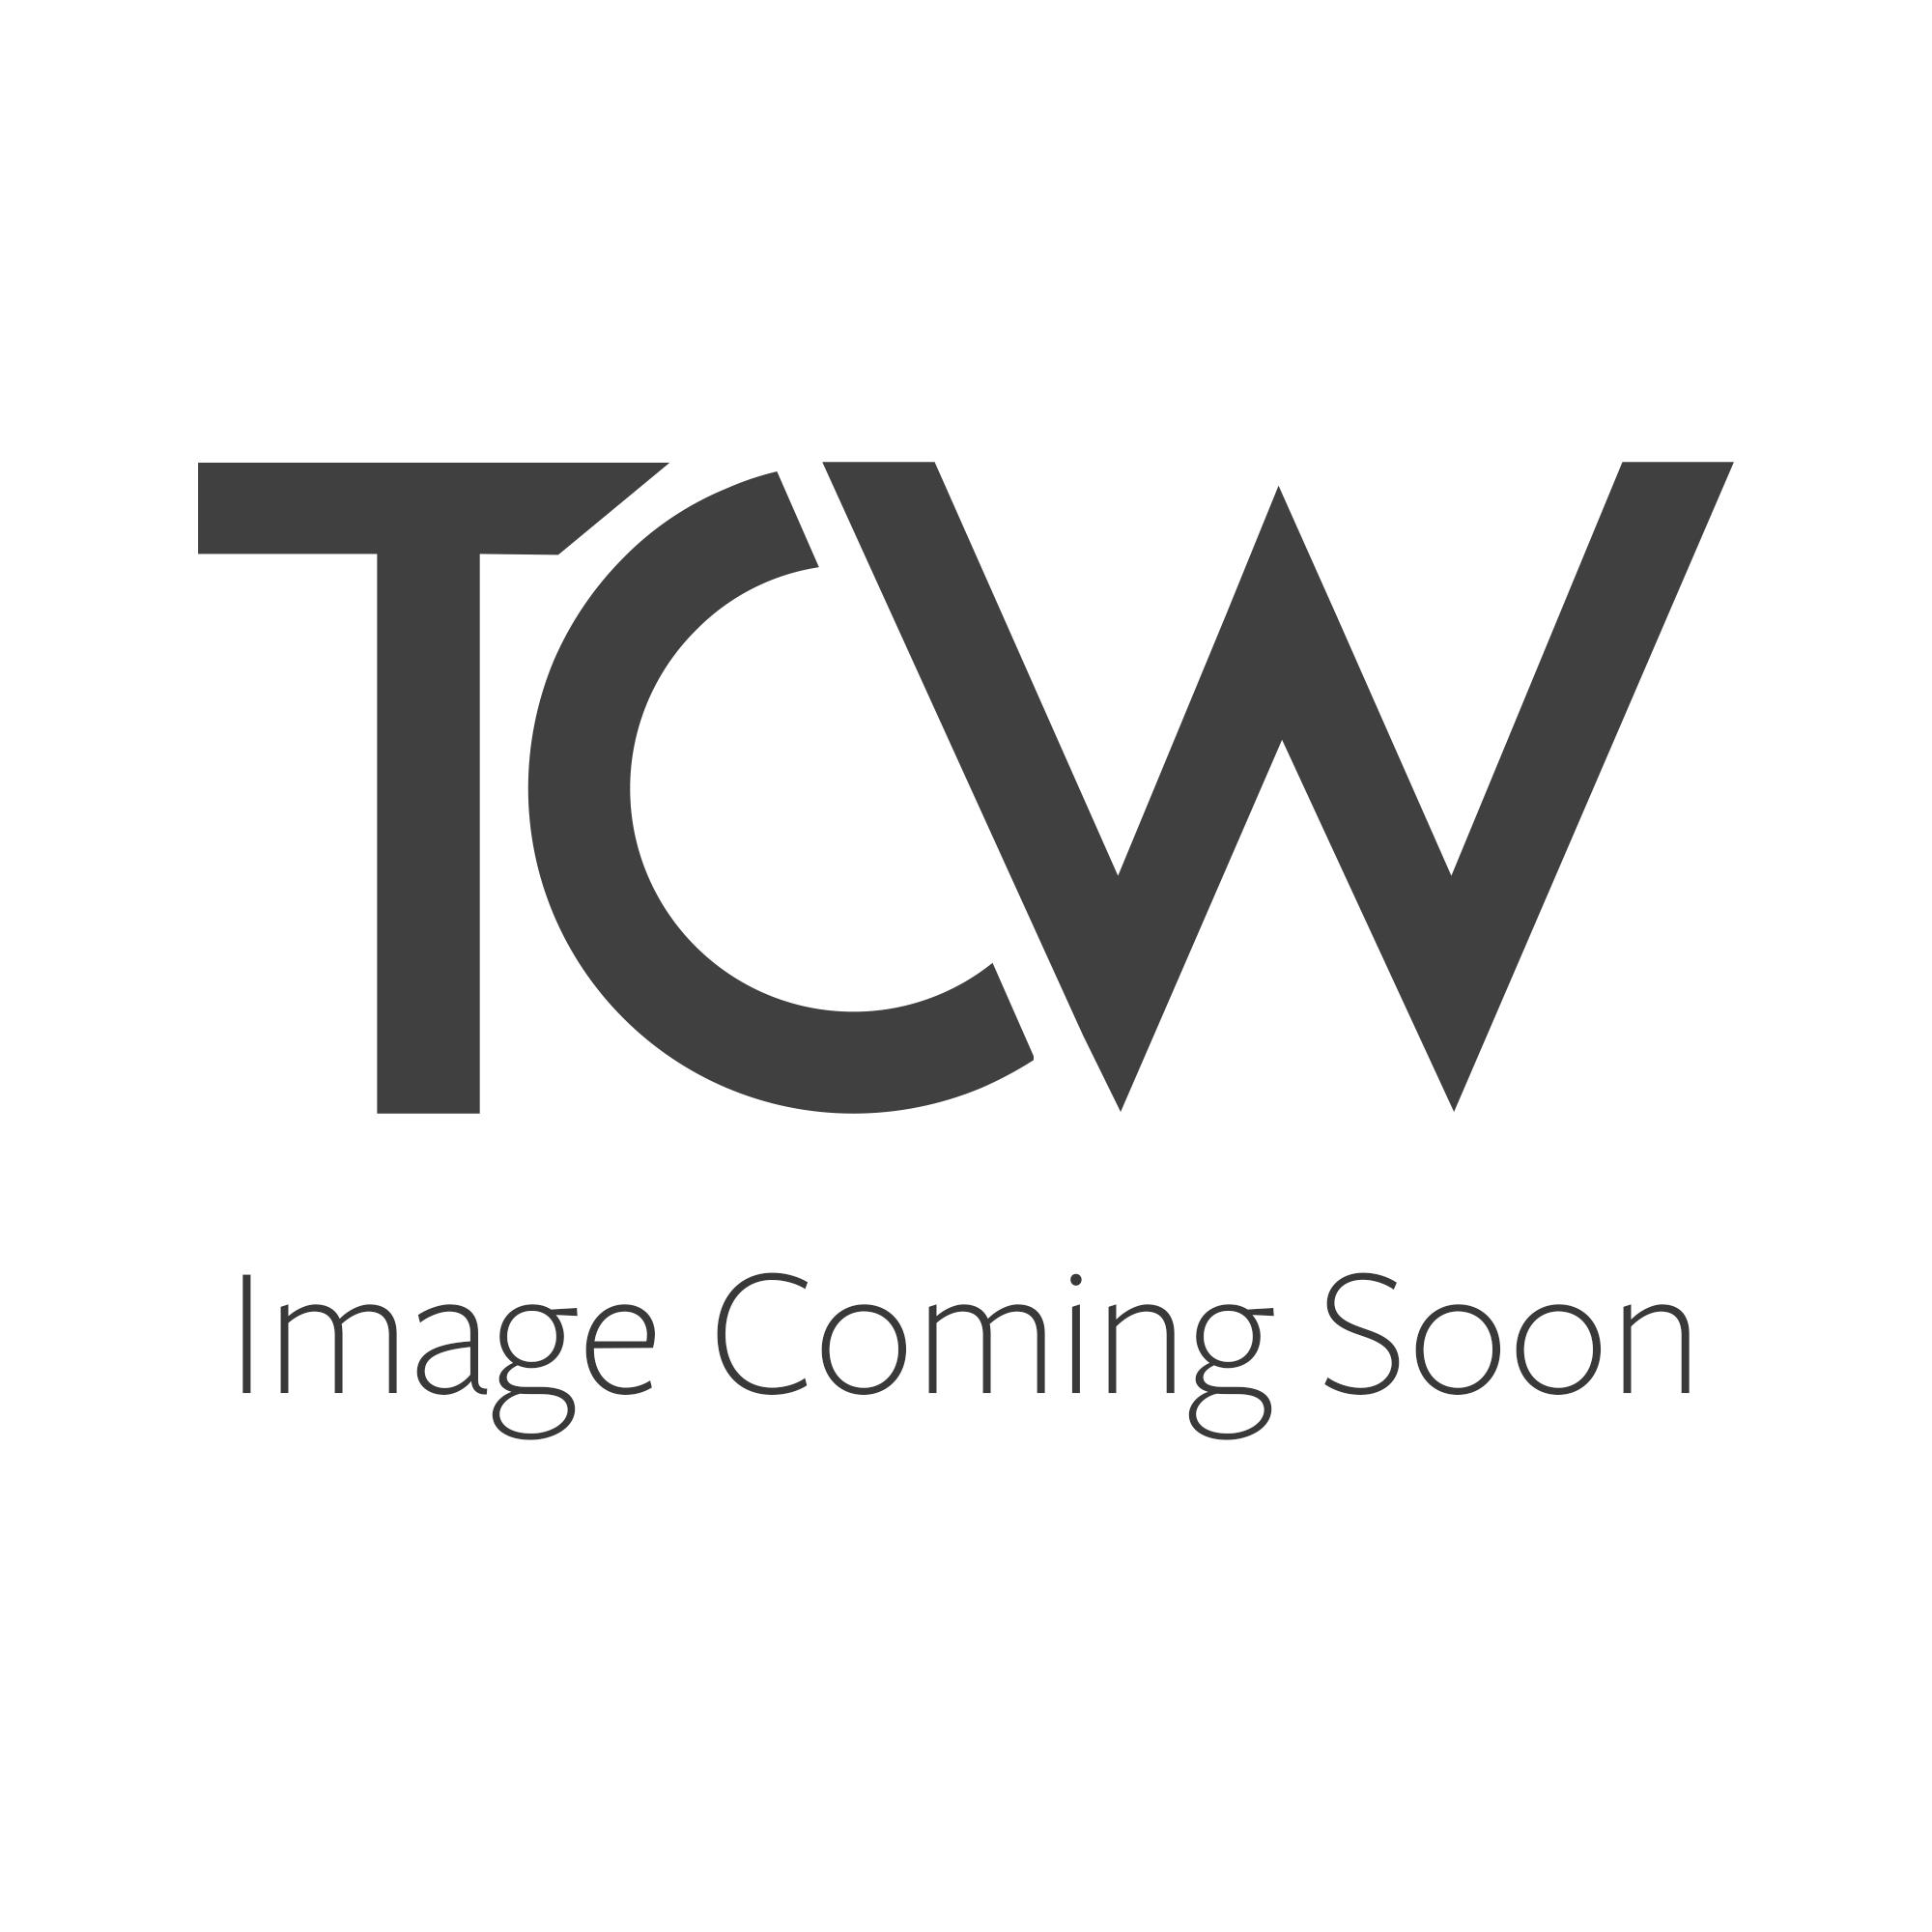 Image 11147.jpg?ixlib=rails 3.0